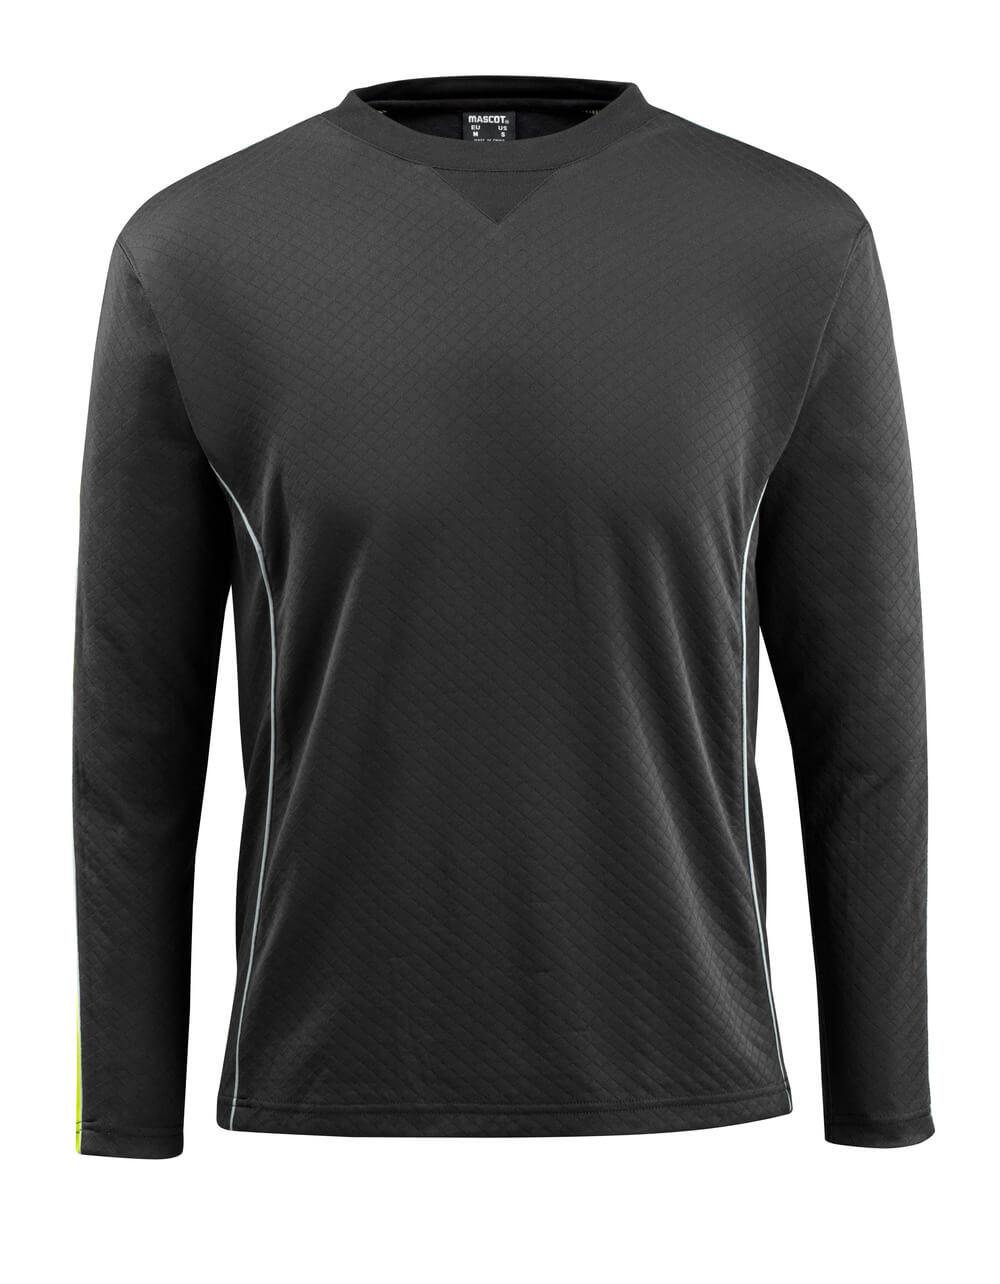 50128-933-0917 T-shirt, long-sleeved - black/high-visibility hi-vis yellow